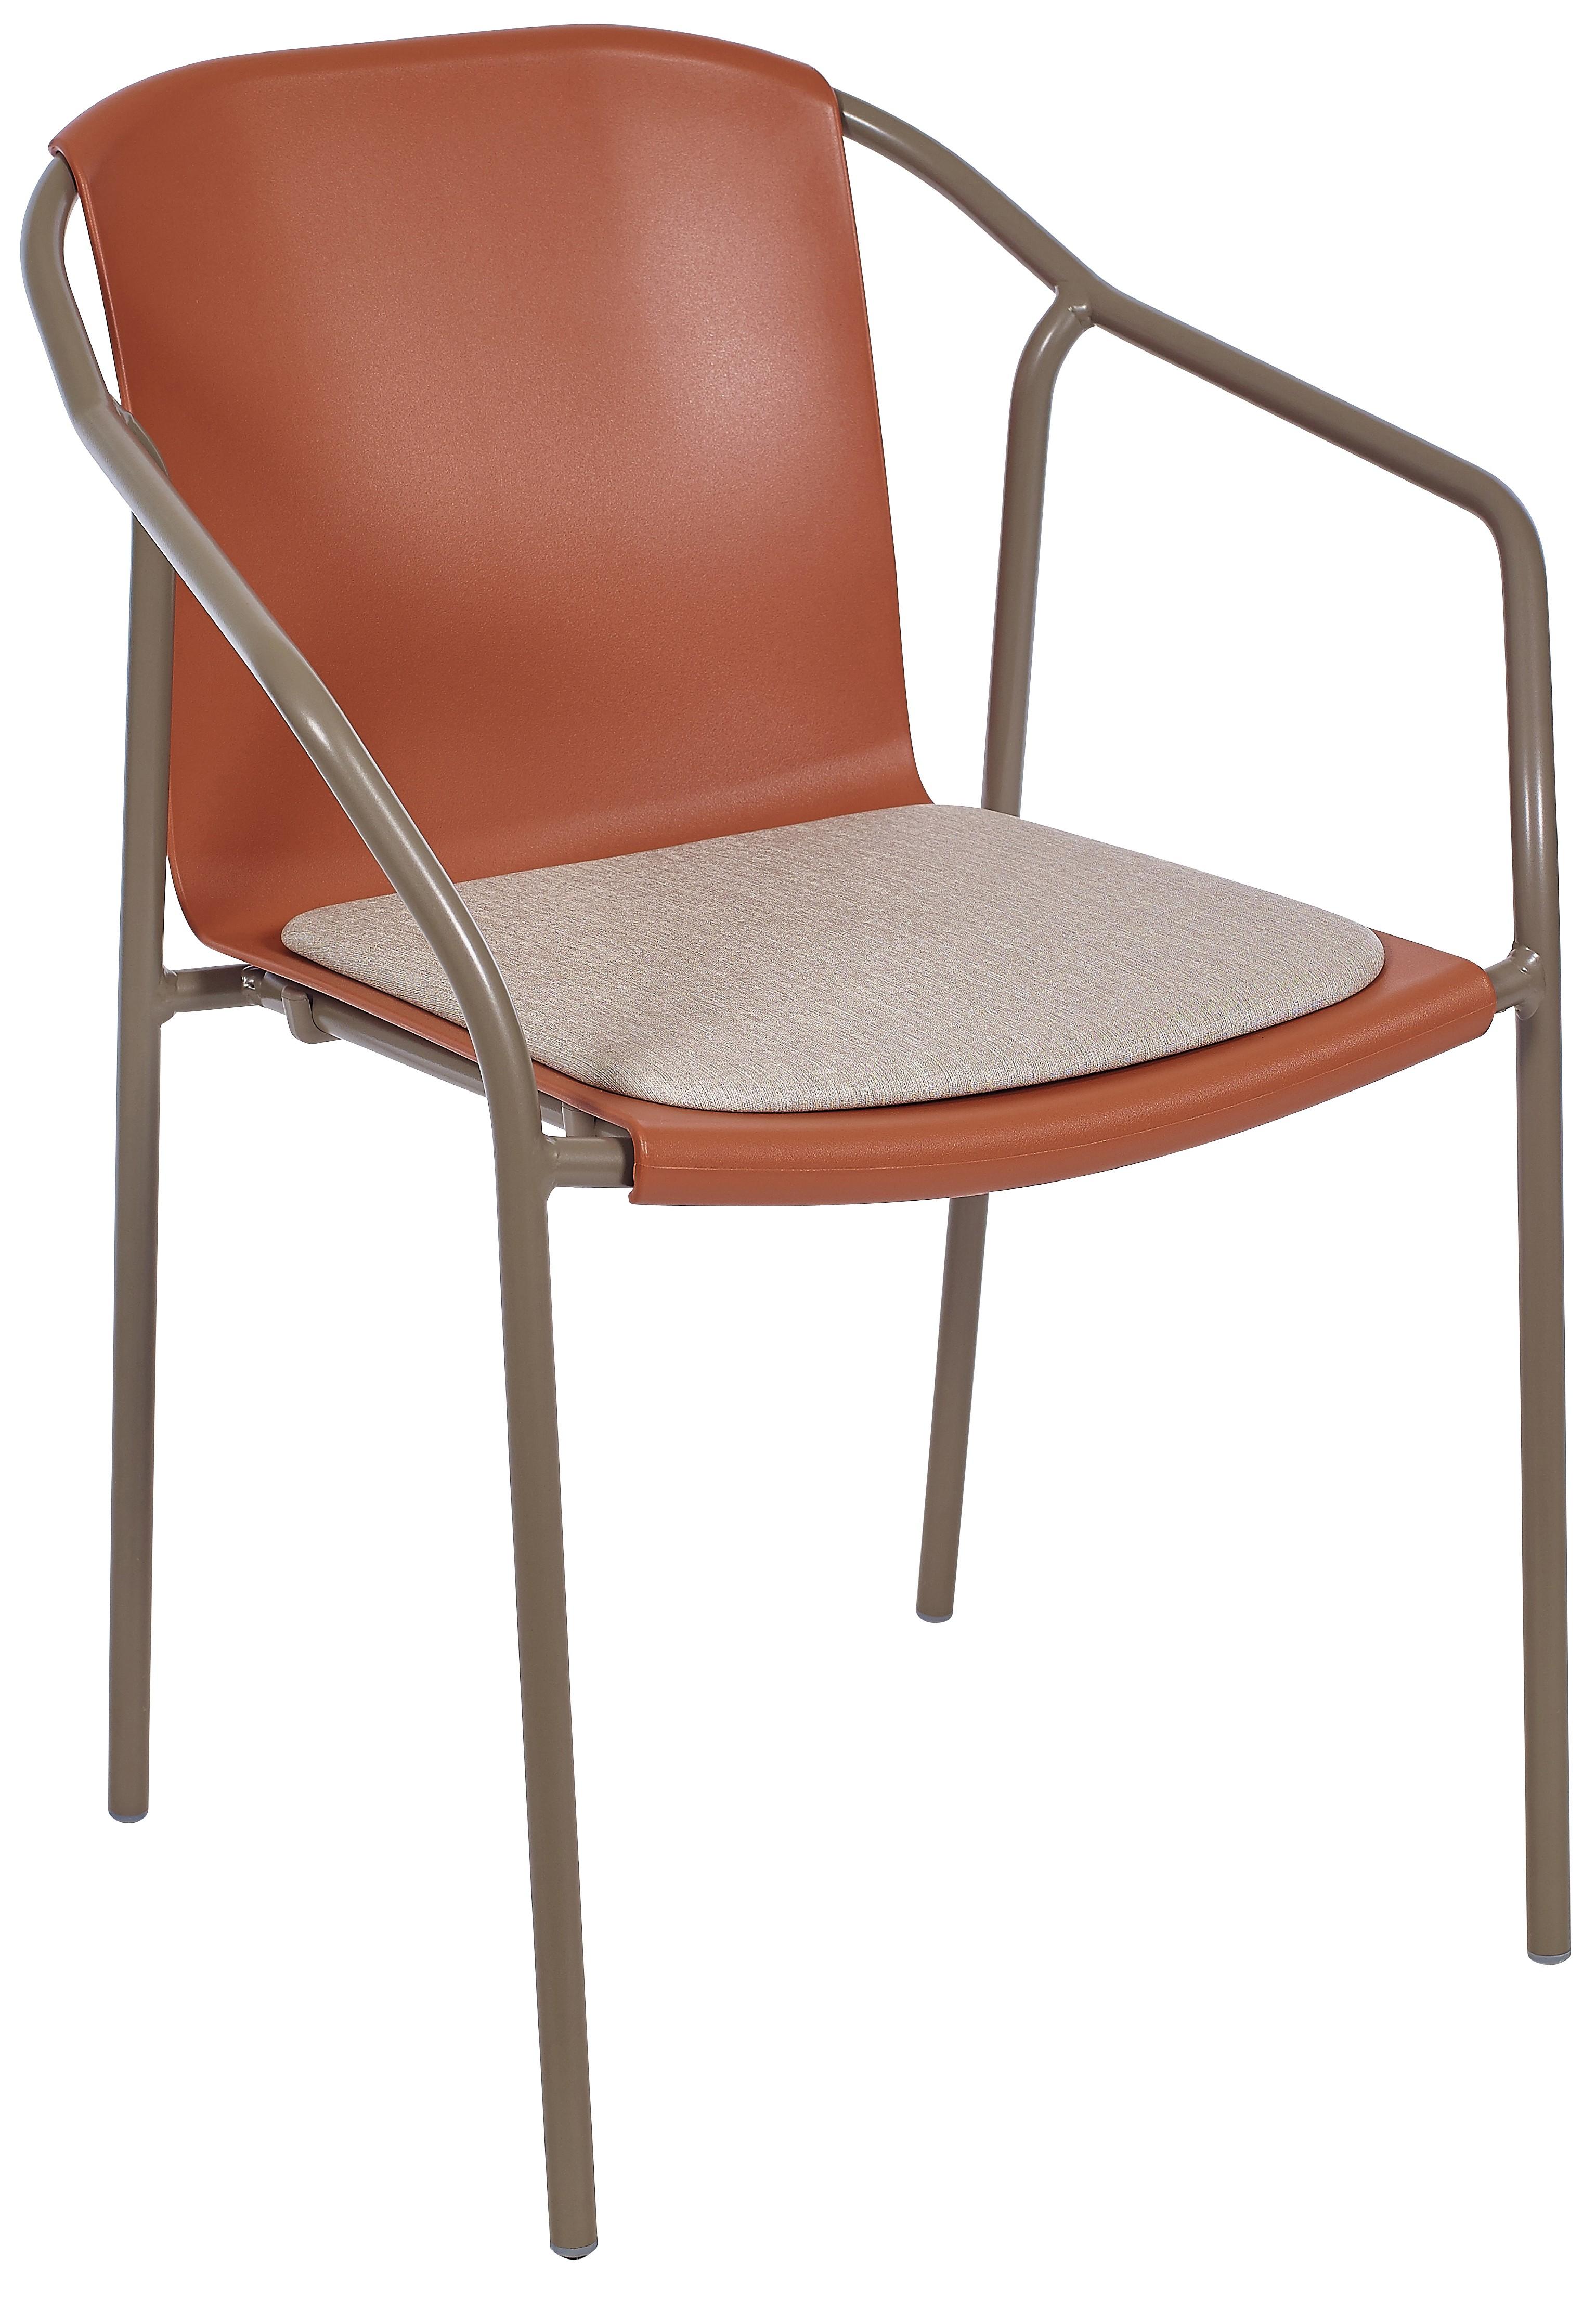 Silla Ezpeleta Con brazos Aluminio Tapizada taupe-terracota-padtaupe taupe